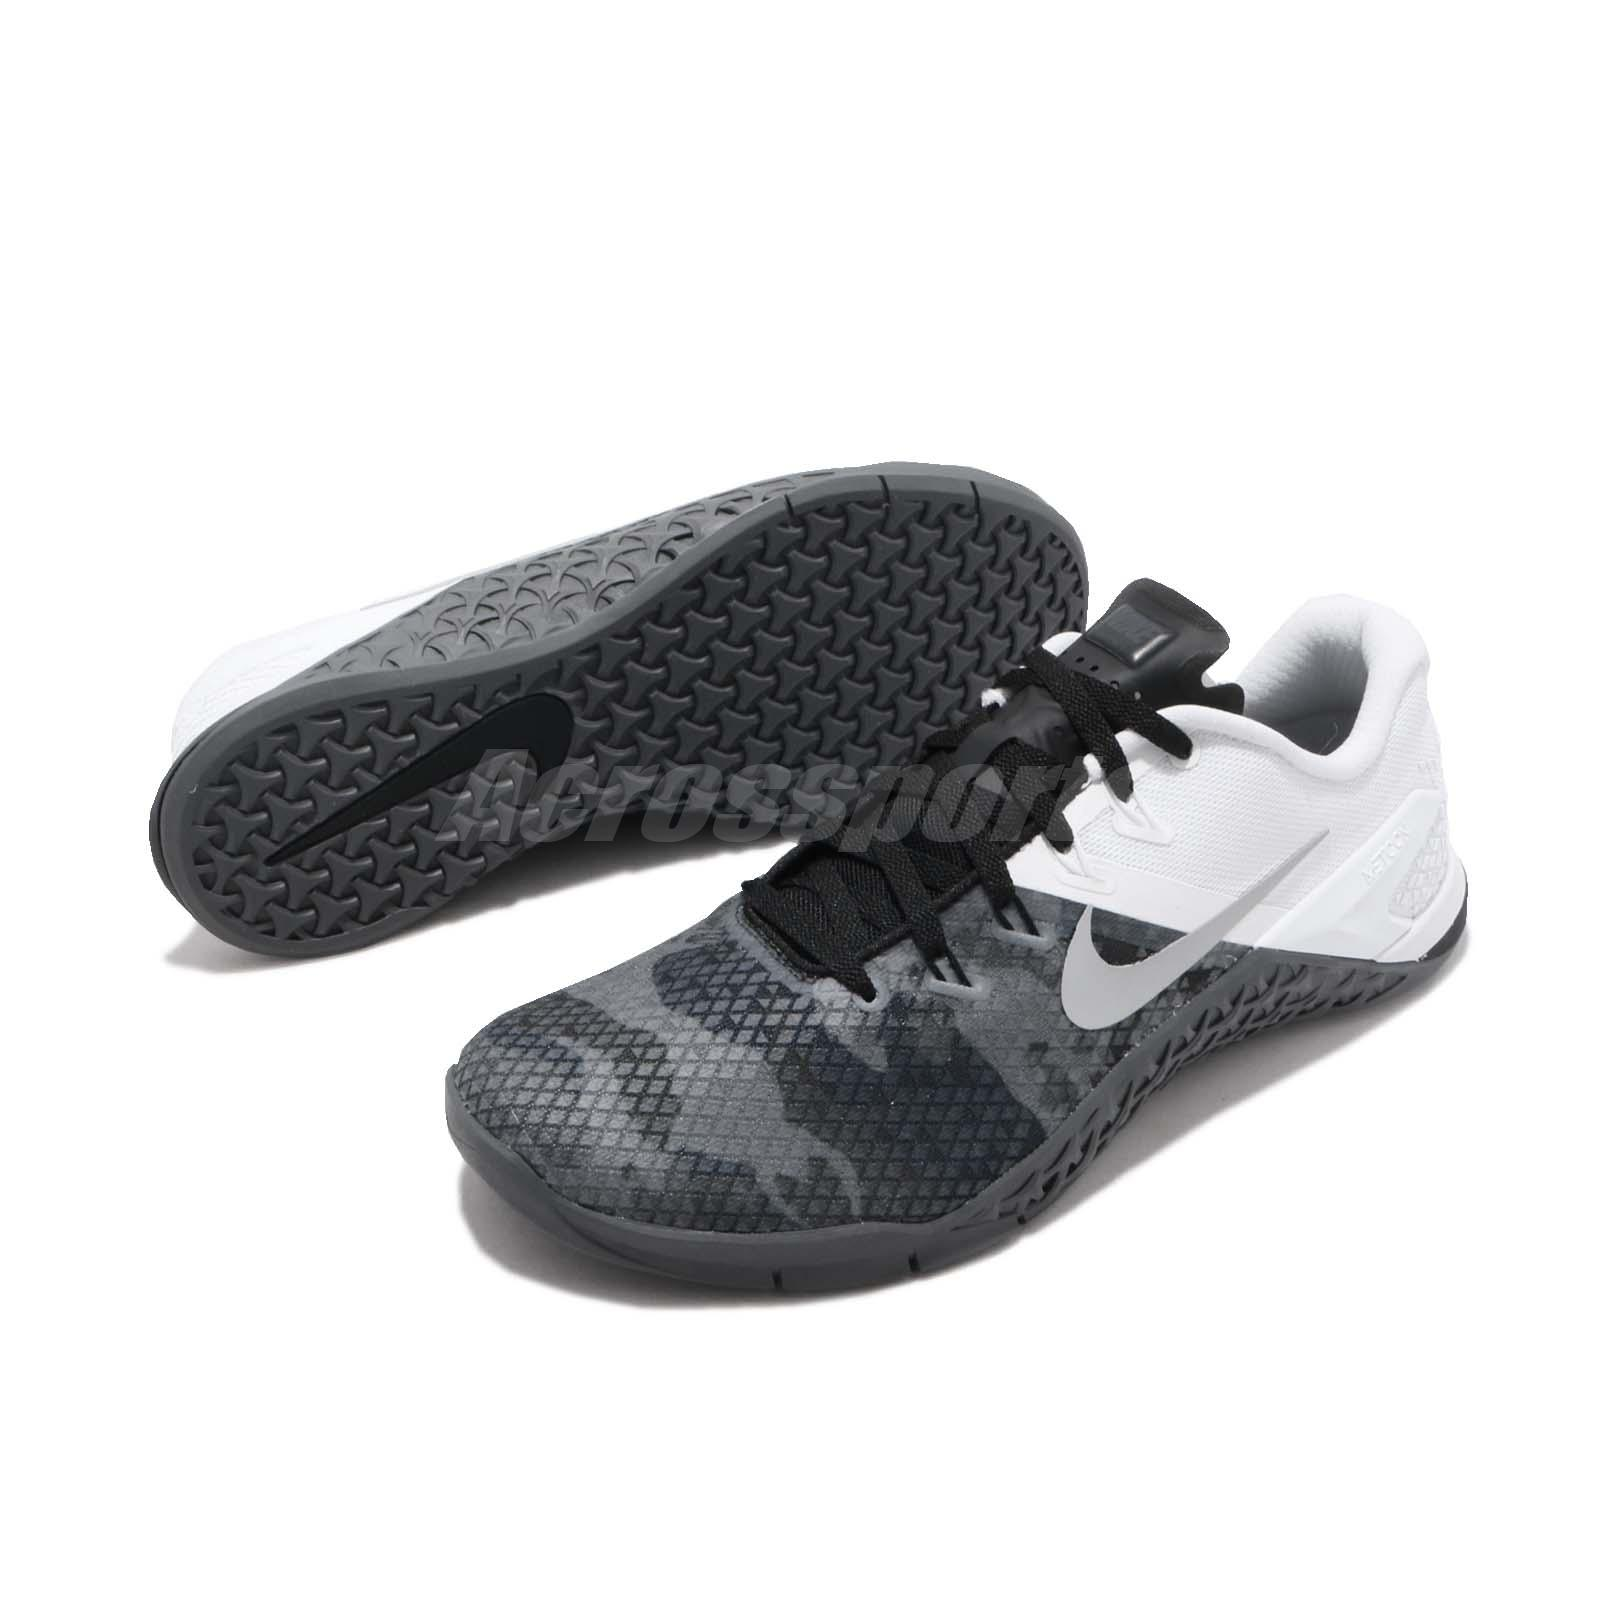 Nike Metcon 4 XD Black Grey Men Cross